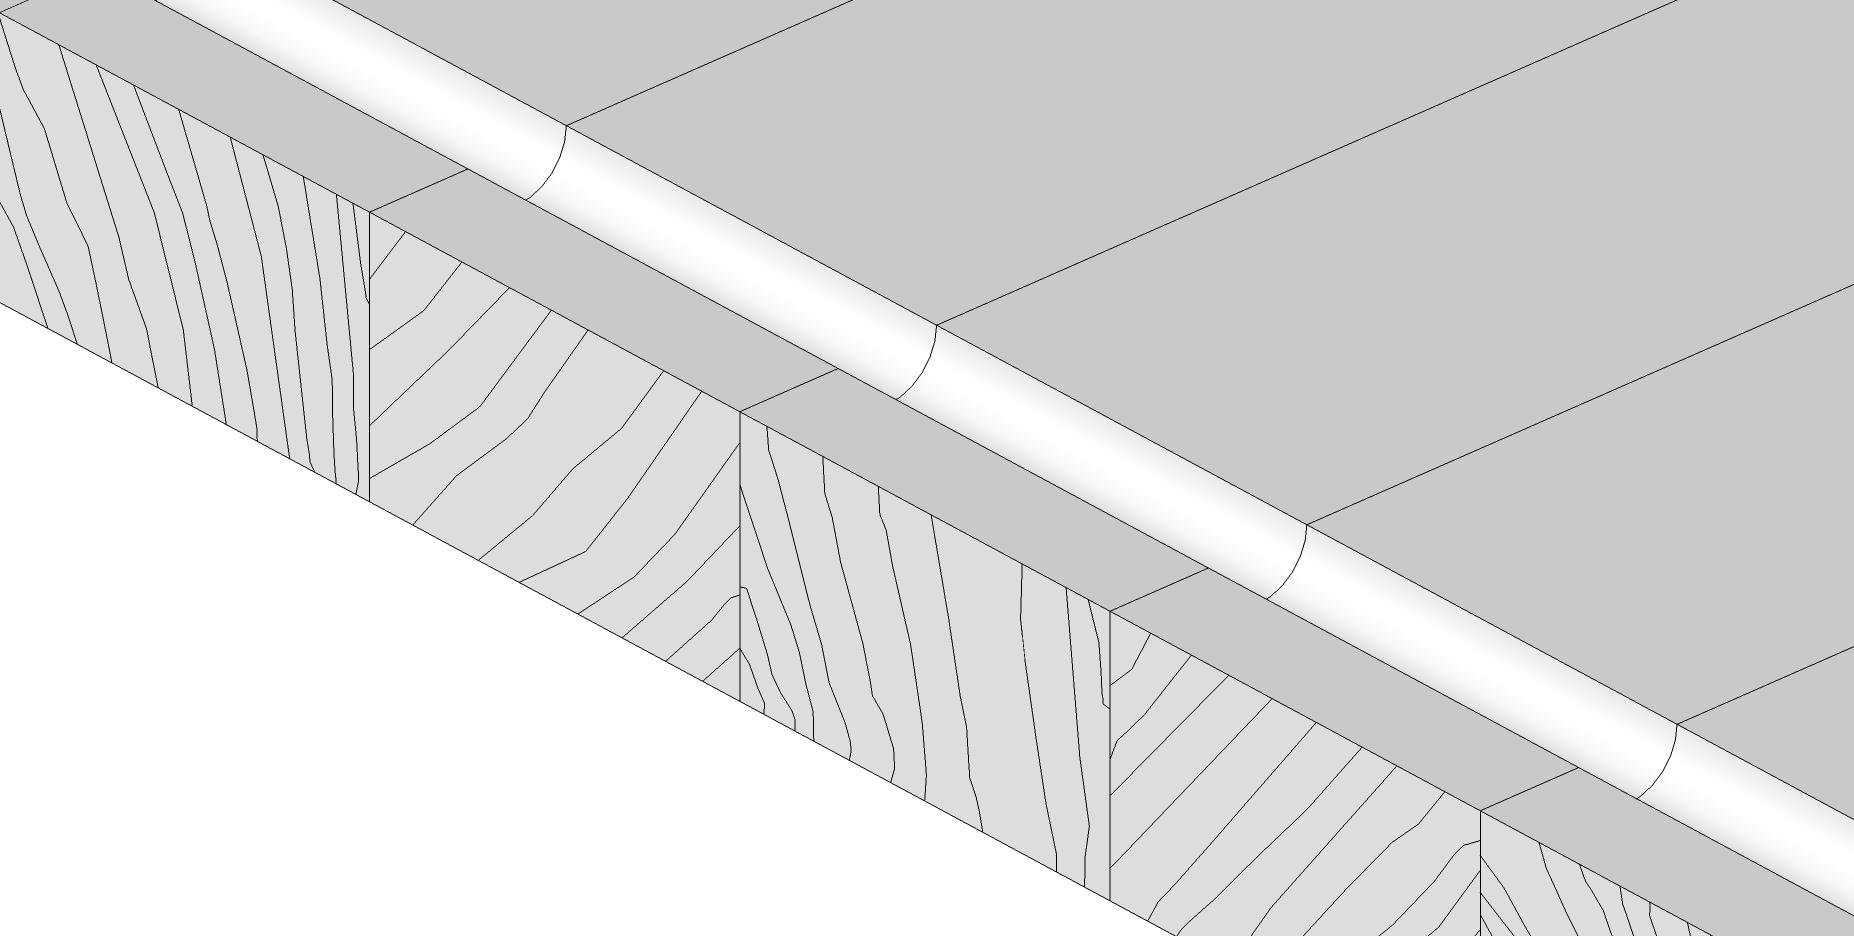 Holzschneidebrett premium Brettevolution 3cm saftrille richtiger randabstand